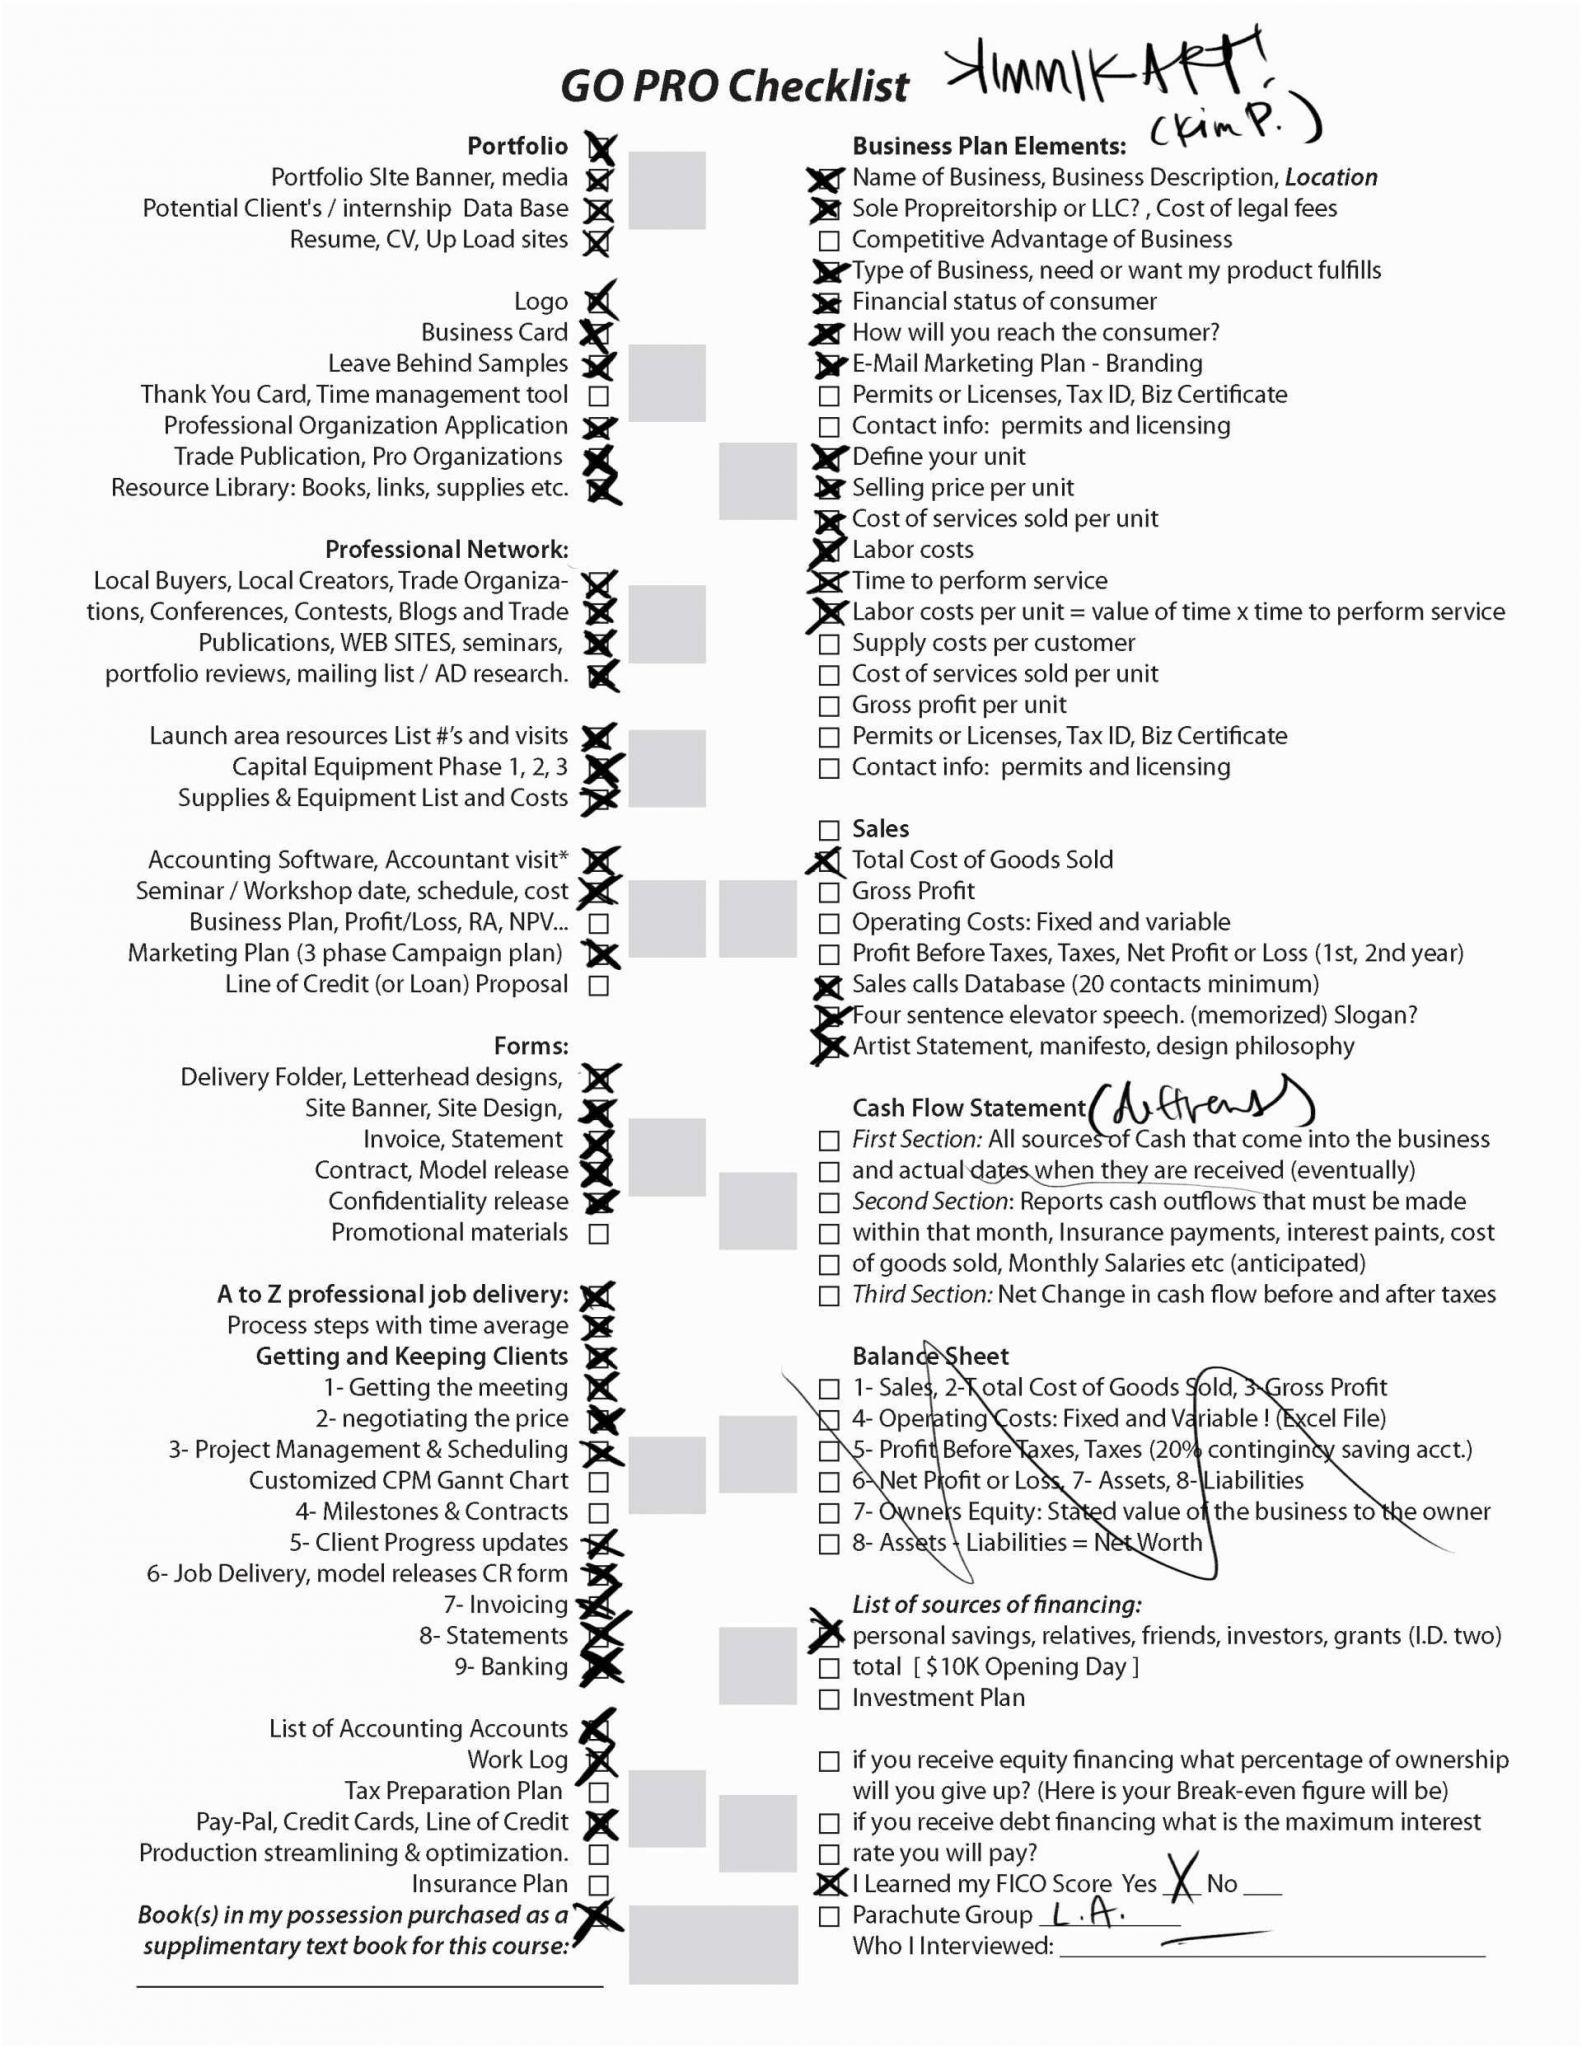 5Th Grade Spelling Words Worksheets   Briefencounters - Free Printable Spelling Worksheets For 5Th Grade